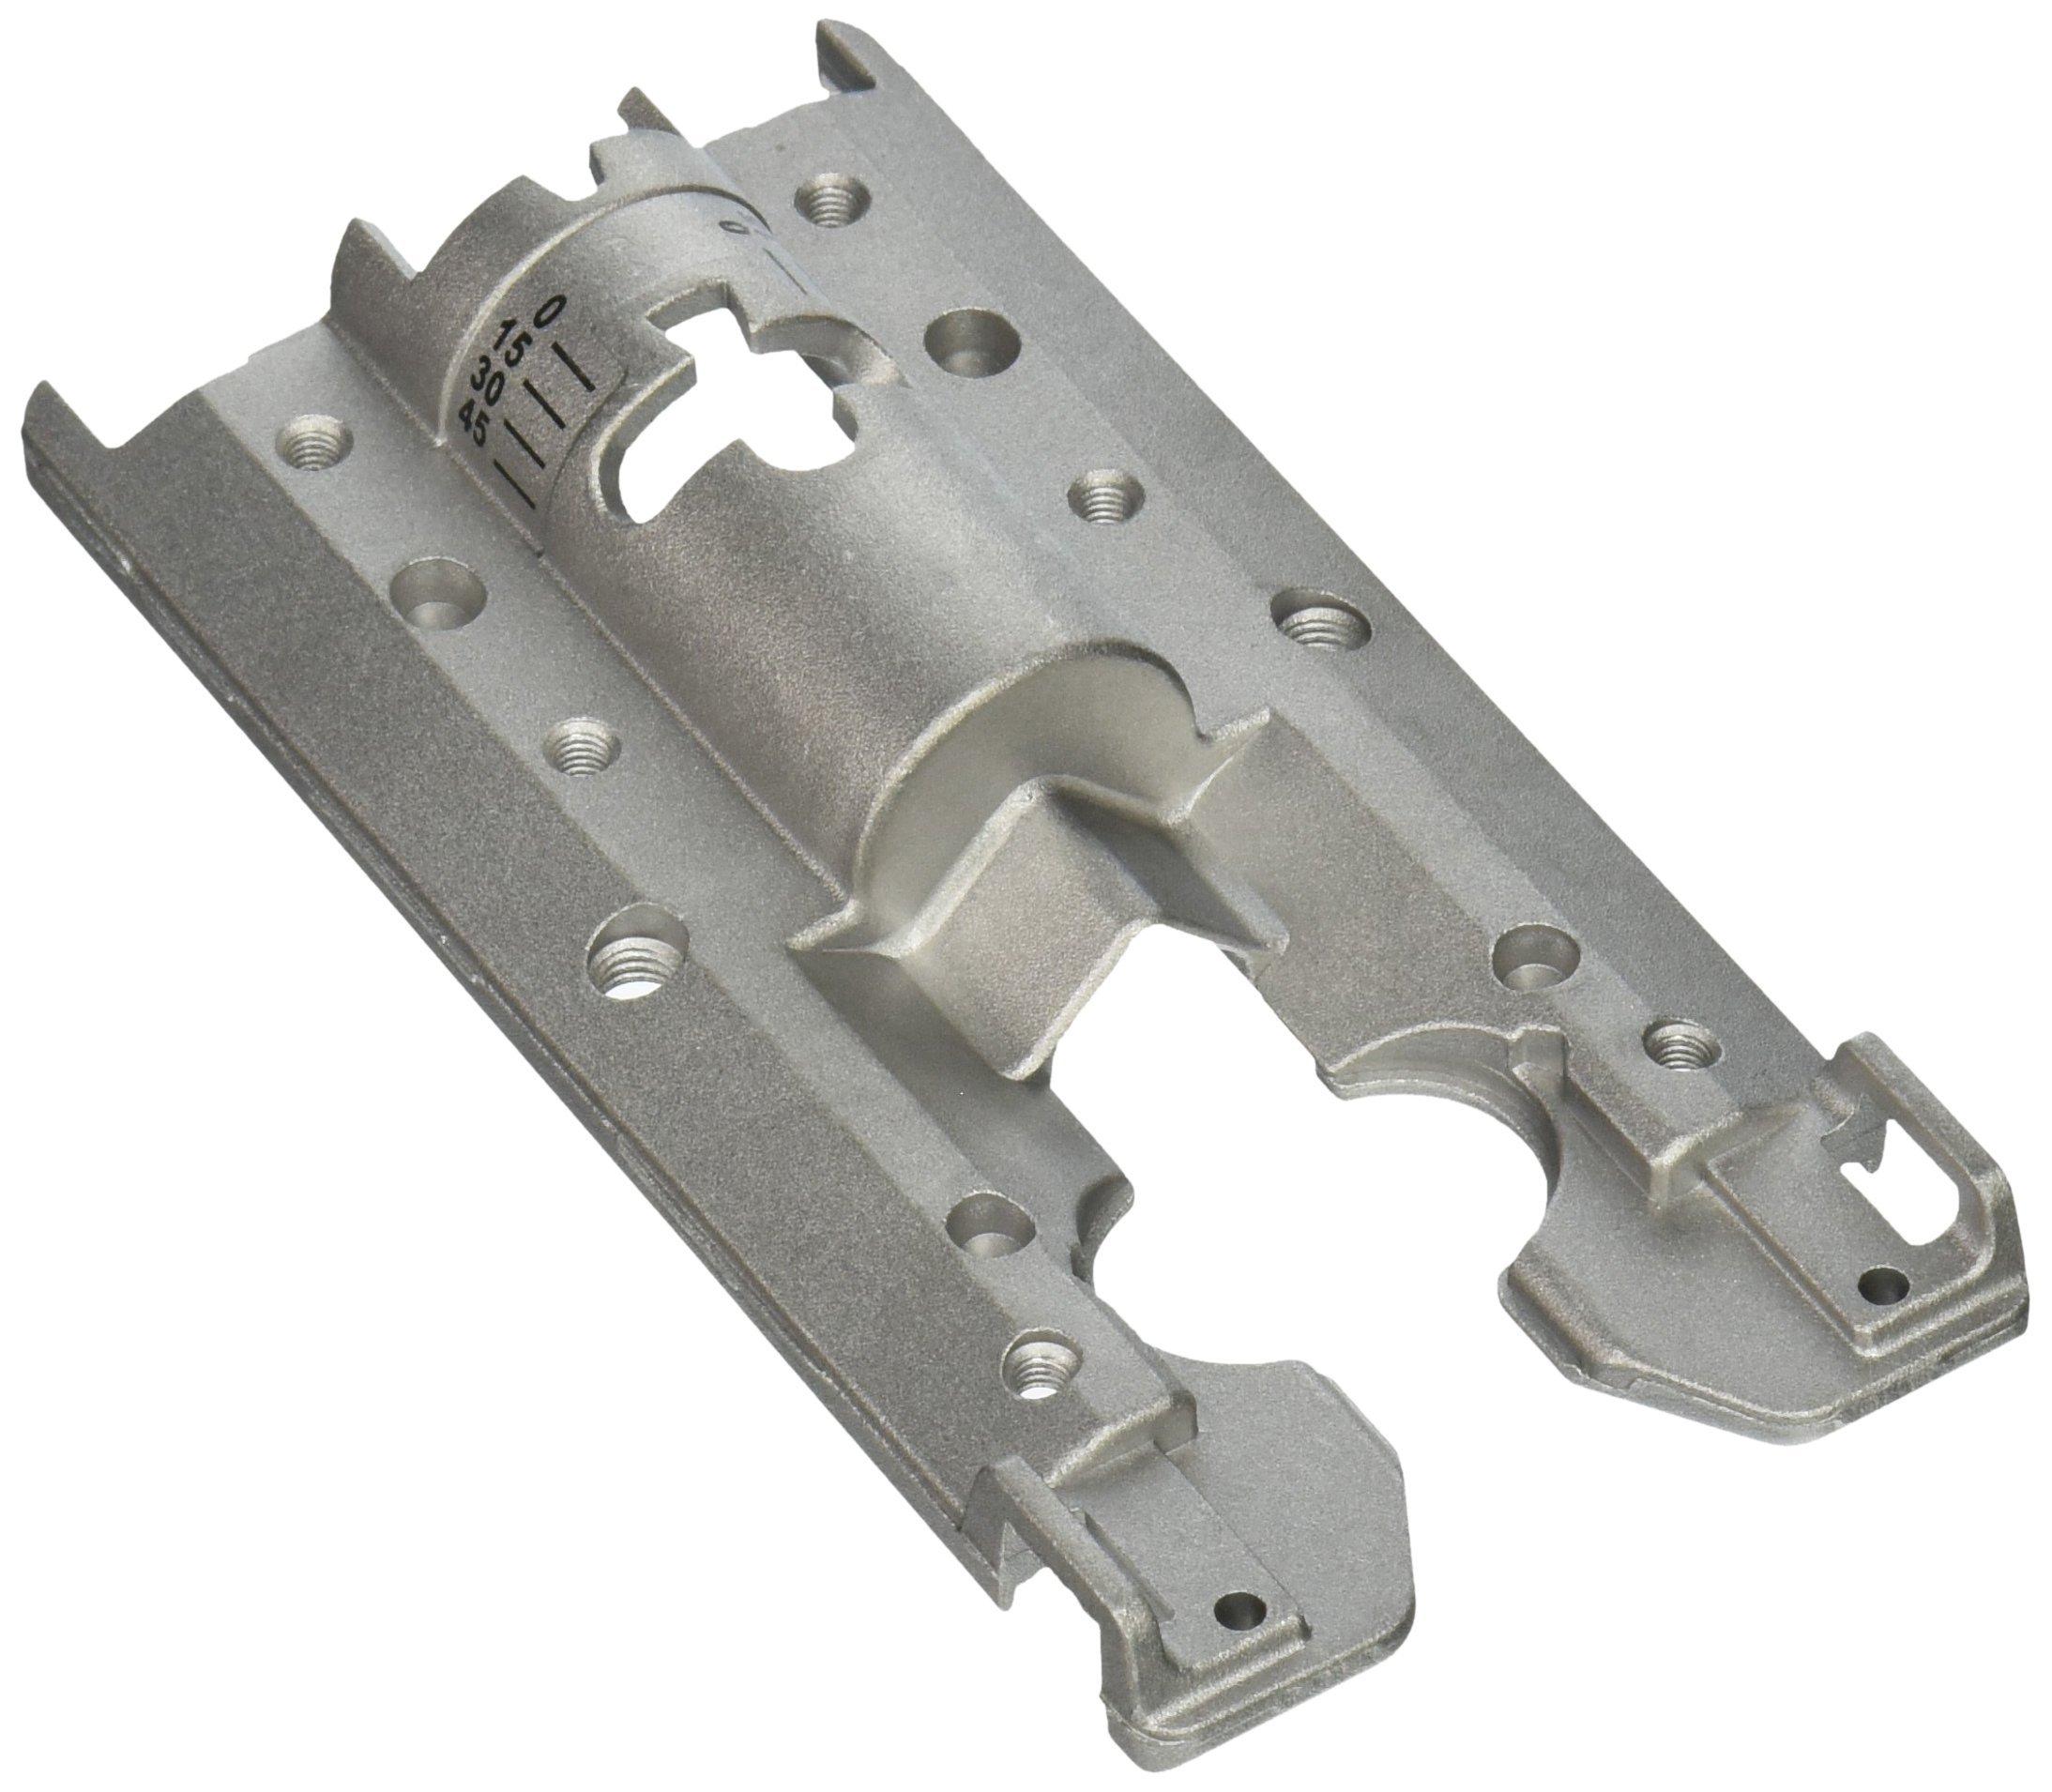 Bosch 1587AVS Replacement Plate 2608000073